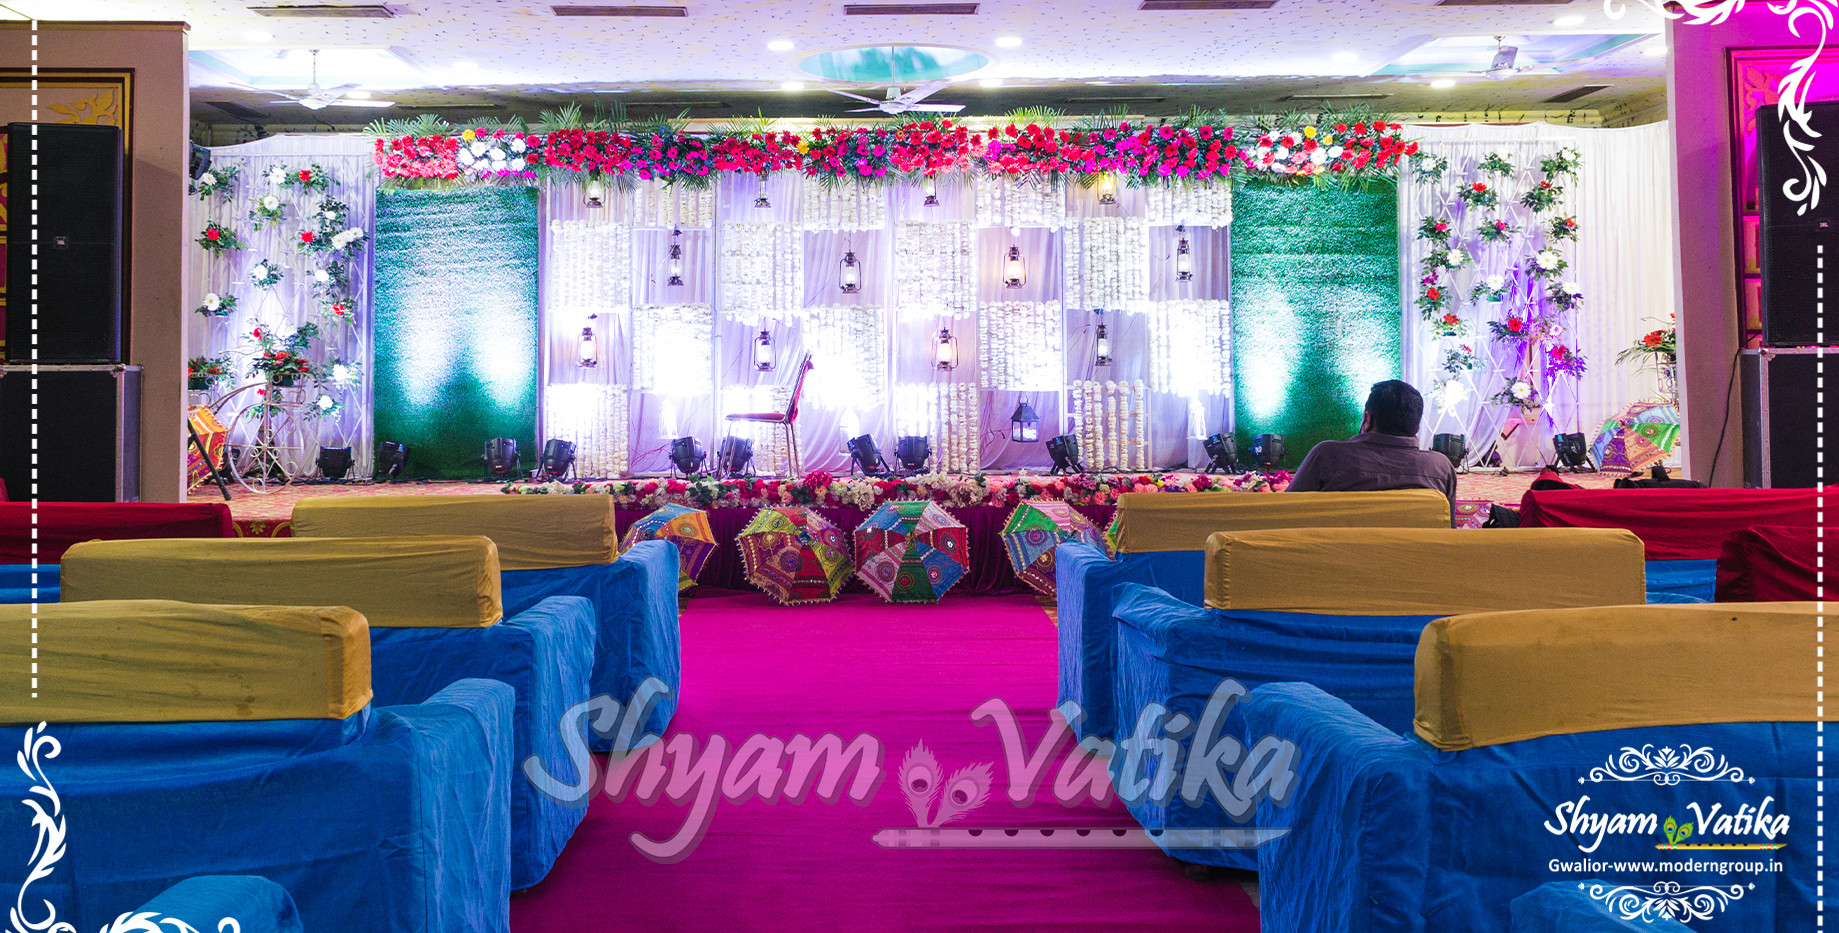 Shyam Vatika Gwalior 05.jpg